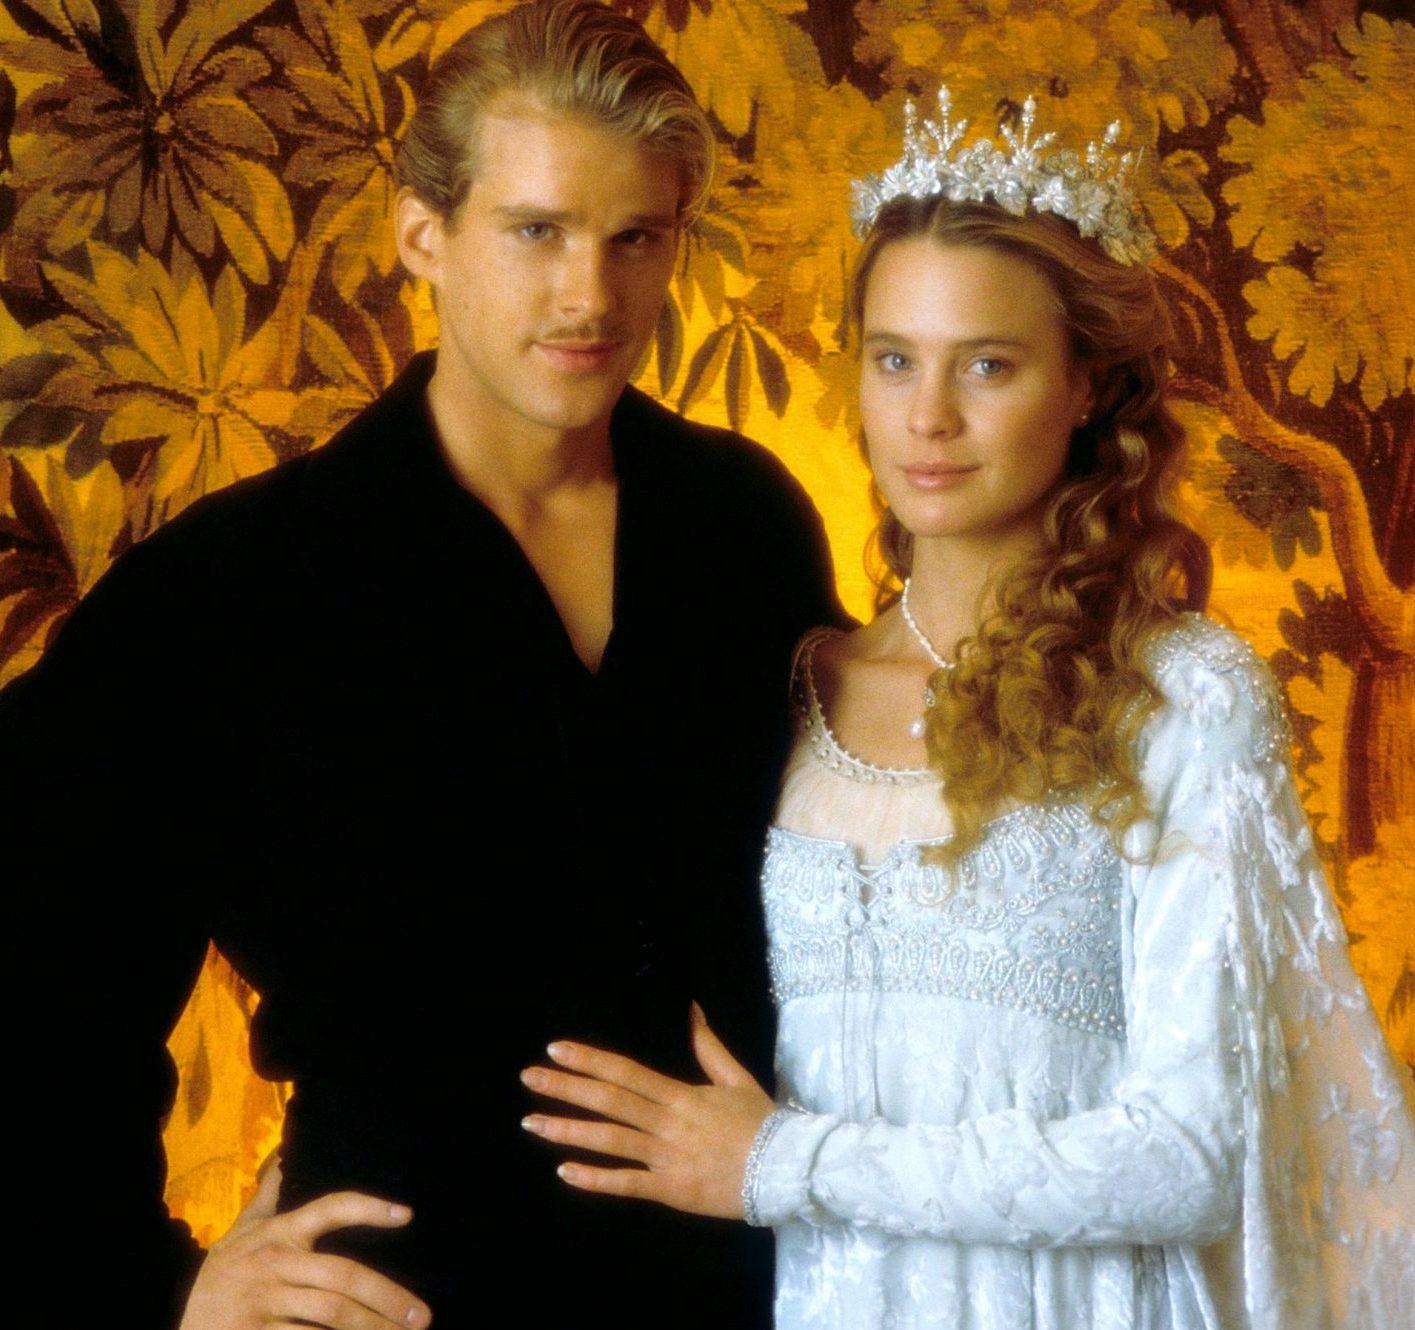 1 83 e1605539713139 30 Inconceivably Good Facts About The Princess Bride